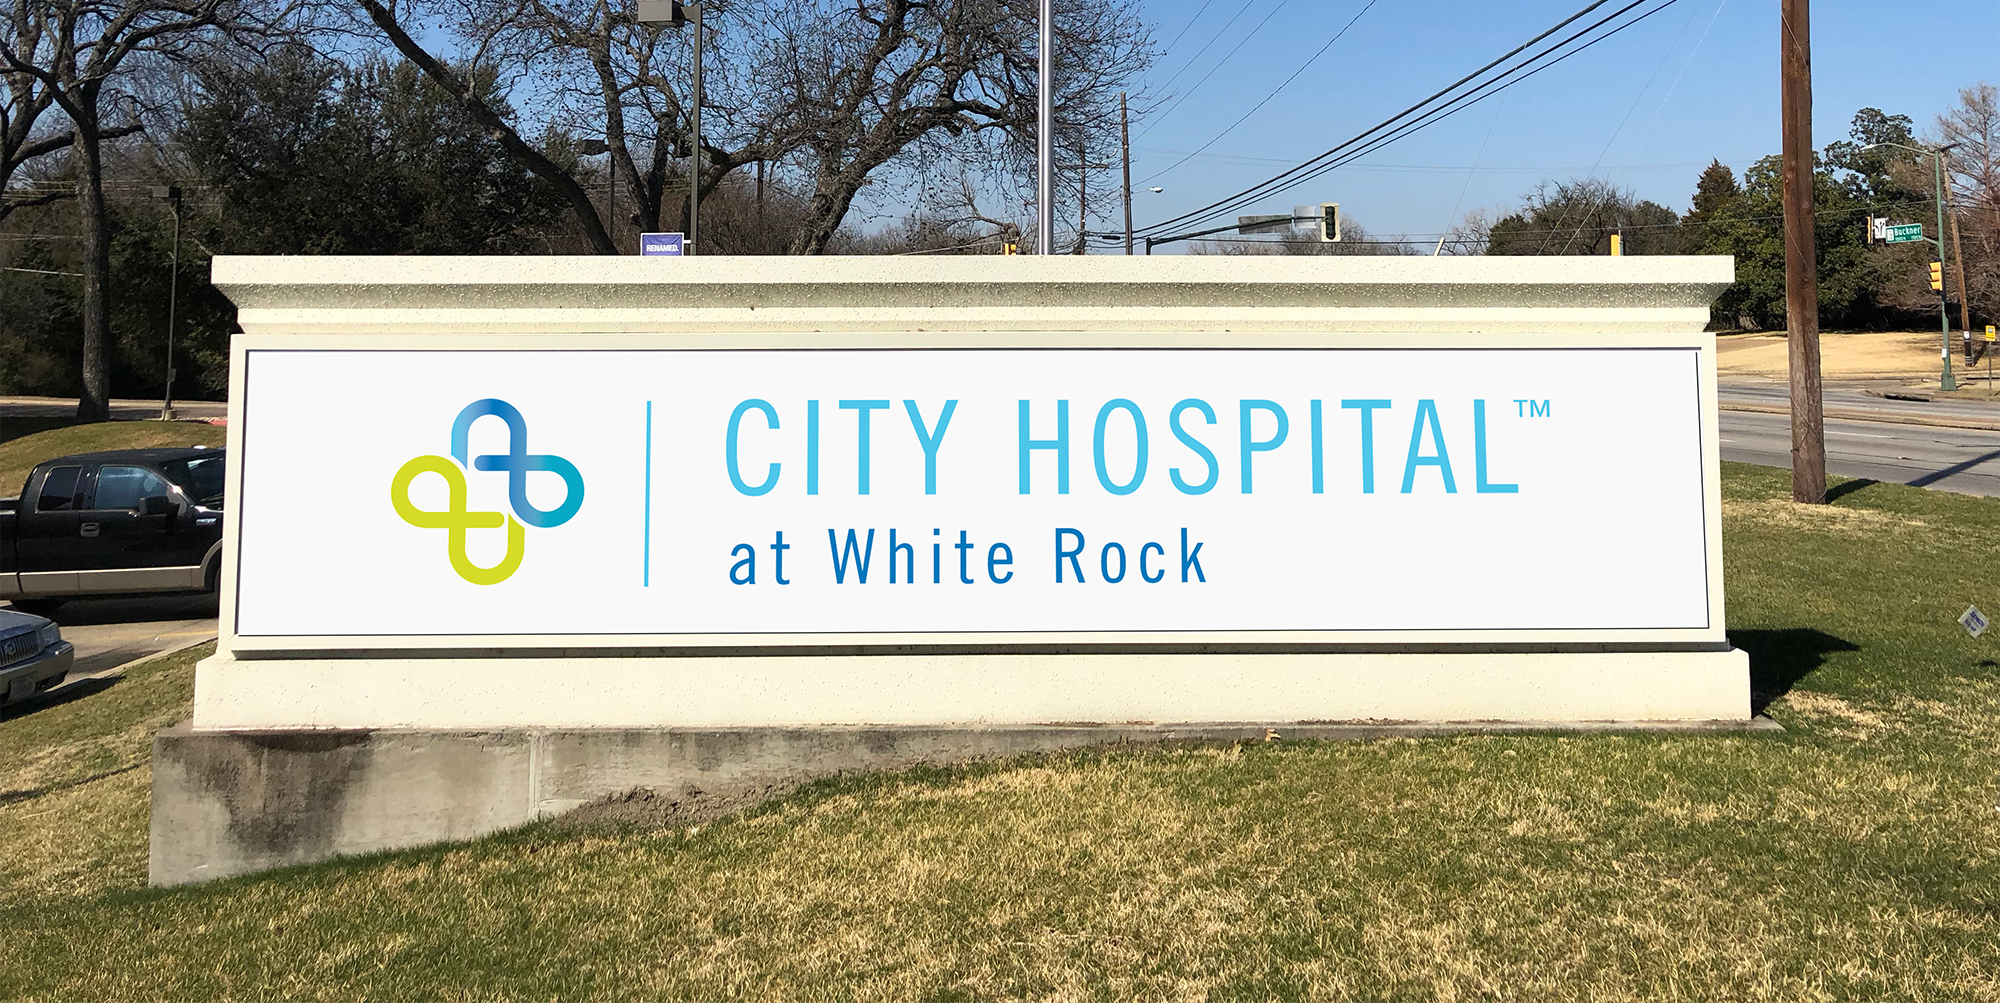 White Rock Hospital Takes On New Name Under New California Owner